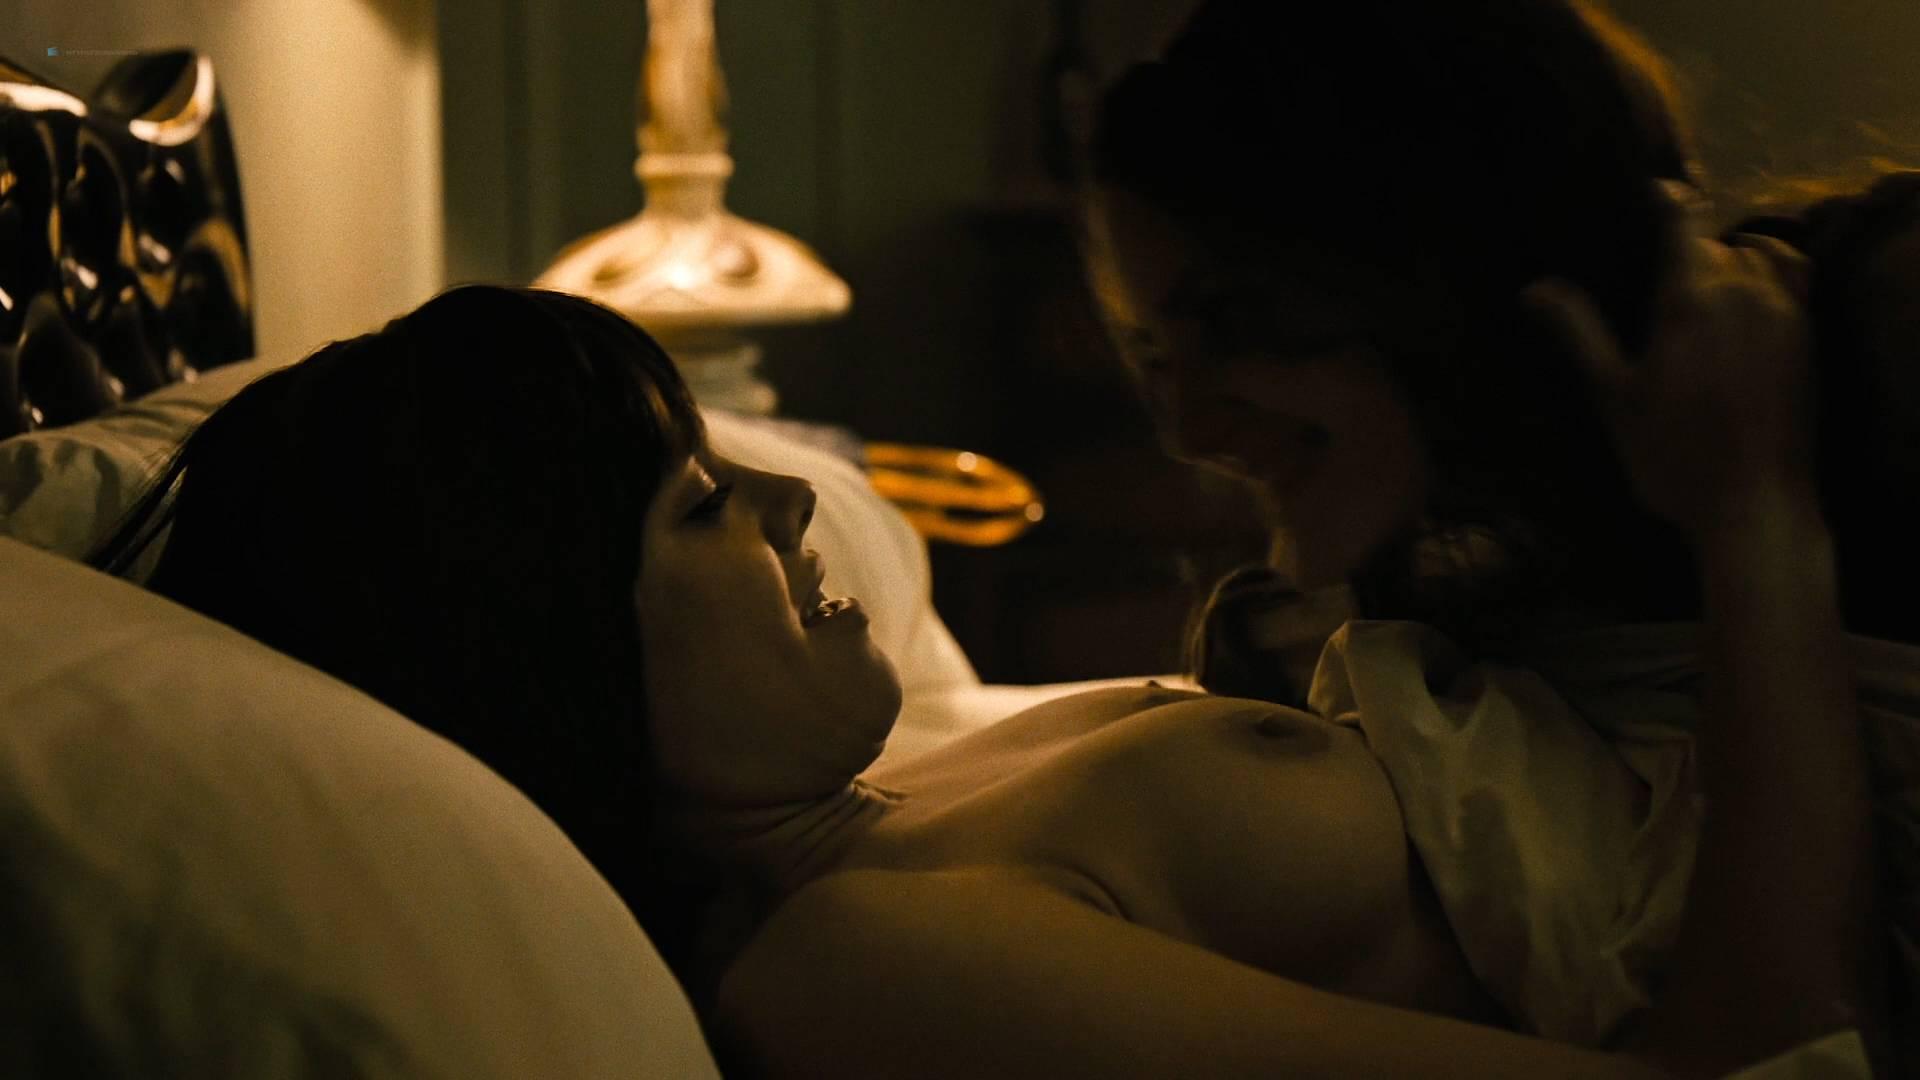 Maggie Gyllenhaal nude oral Margarita Levieva nude sex Kayla Foster lesbian - The Deuce (2017) s1e4 HD1080p (15)